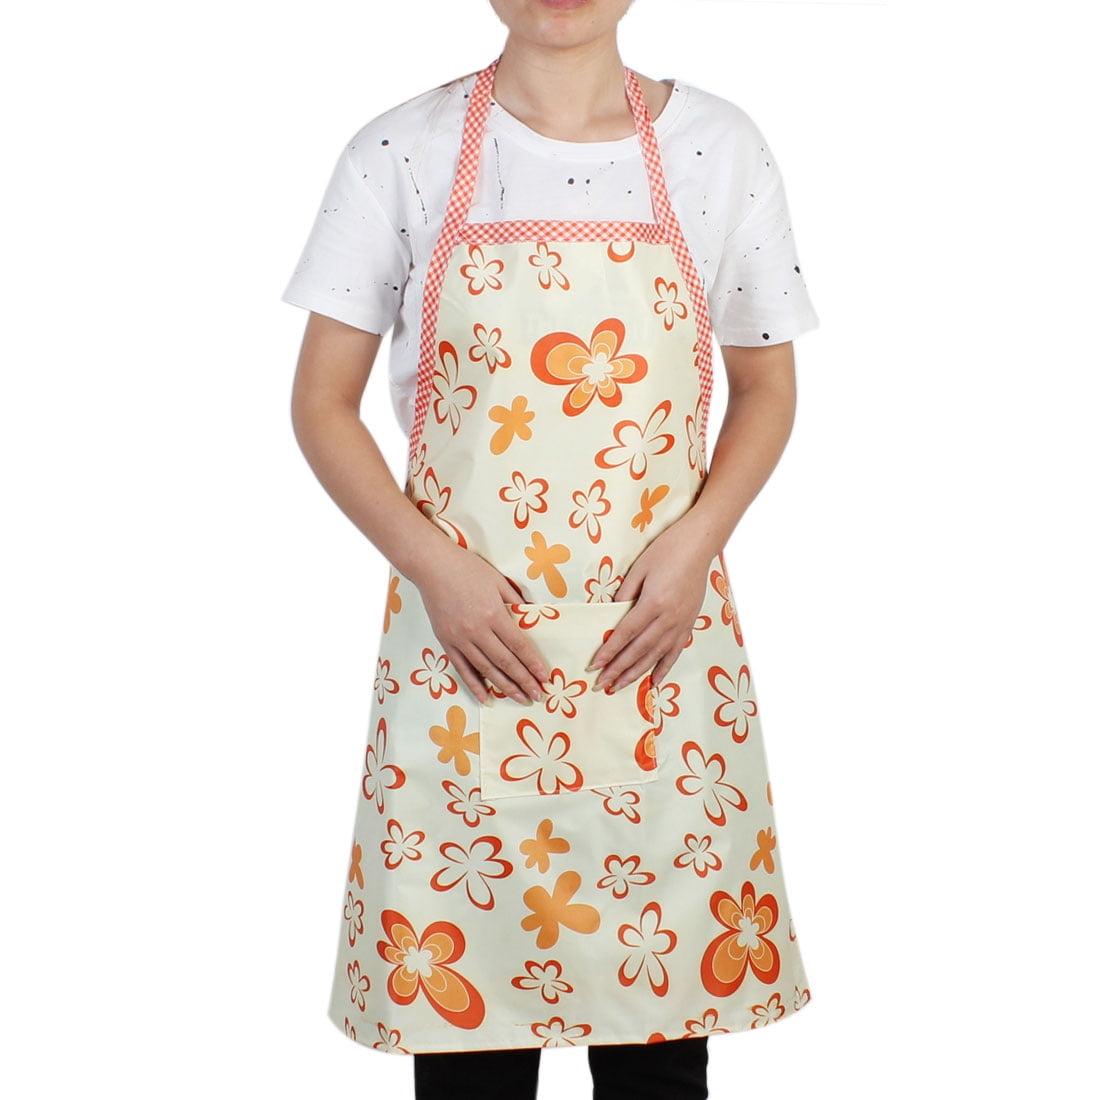 Kitchen Household Orange Flower Pattern Water Resistant Cooking Apron Bib Dress